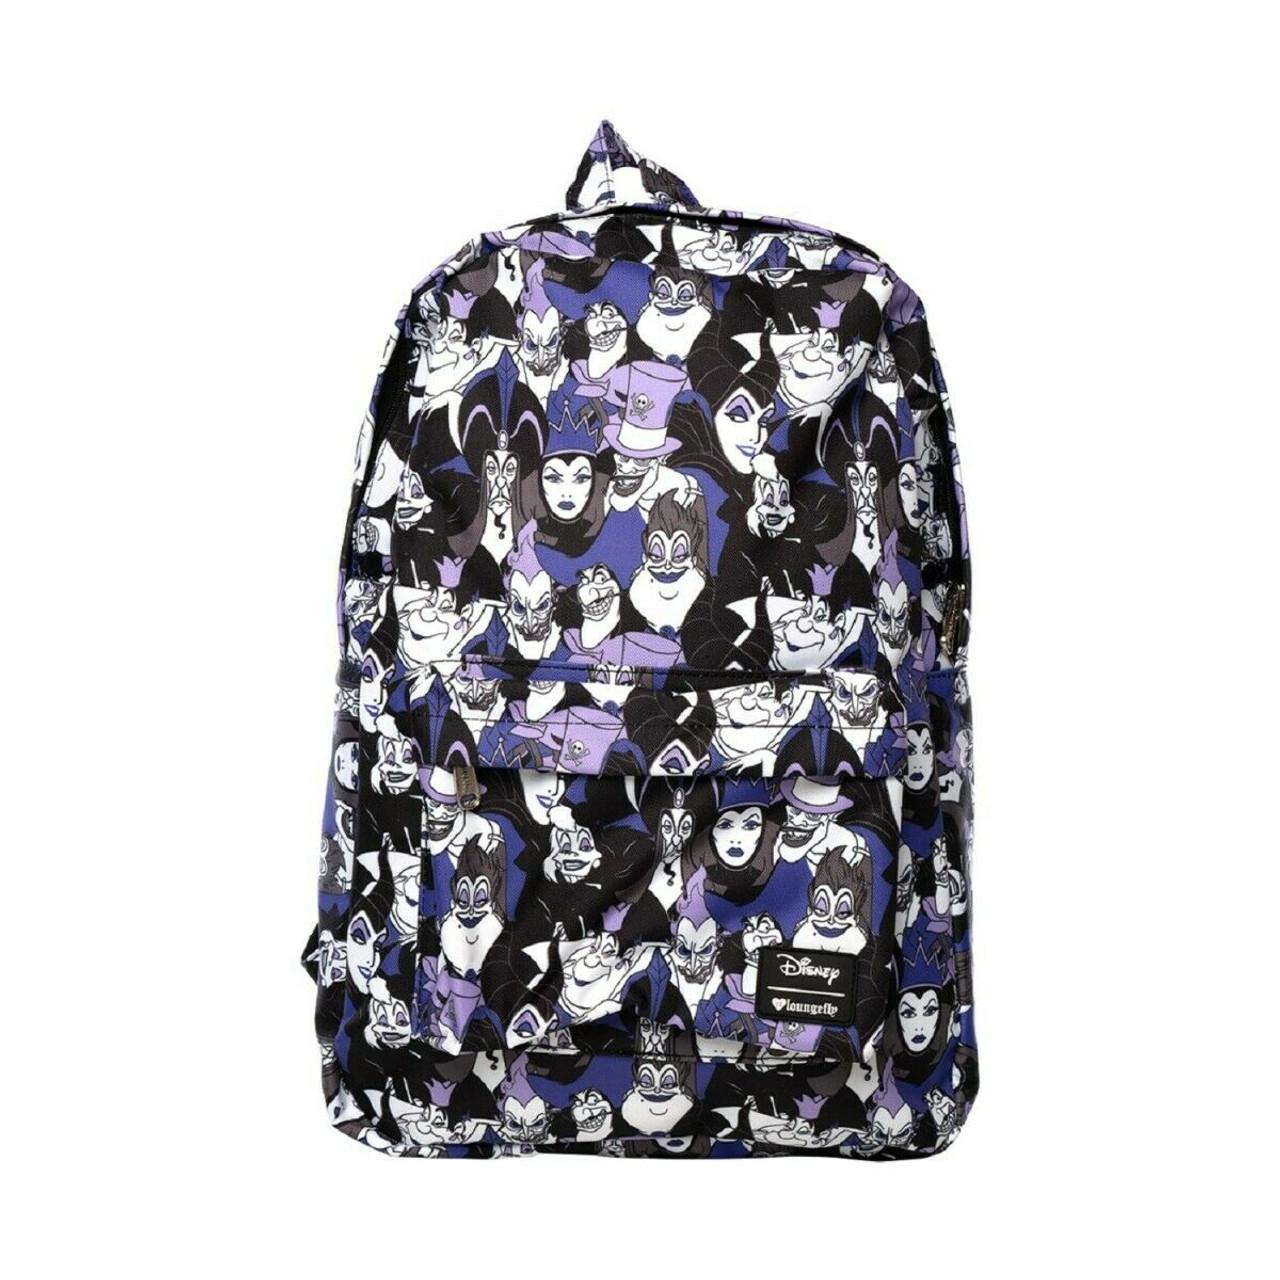 Loungefly Disney Villains Ursula Maleficent School Book Bag Backpack Wdbk0676